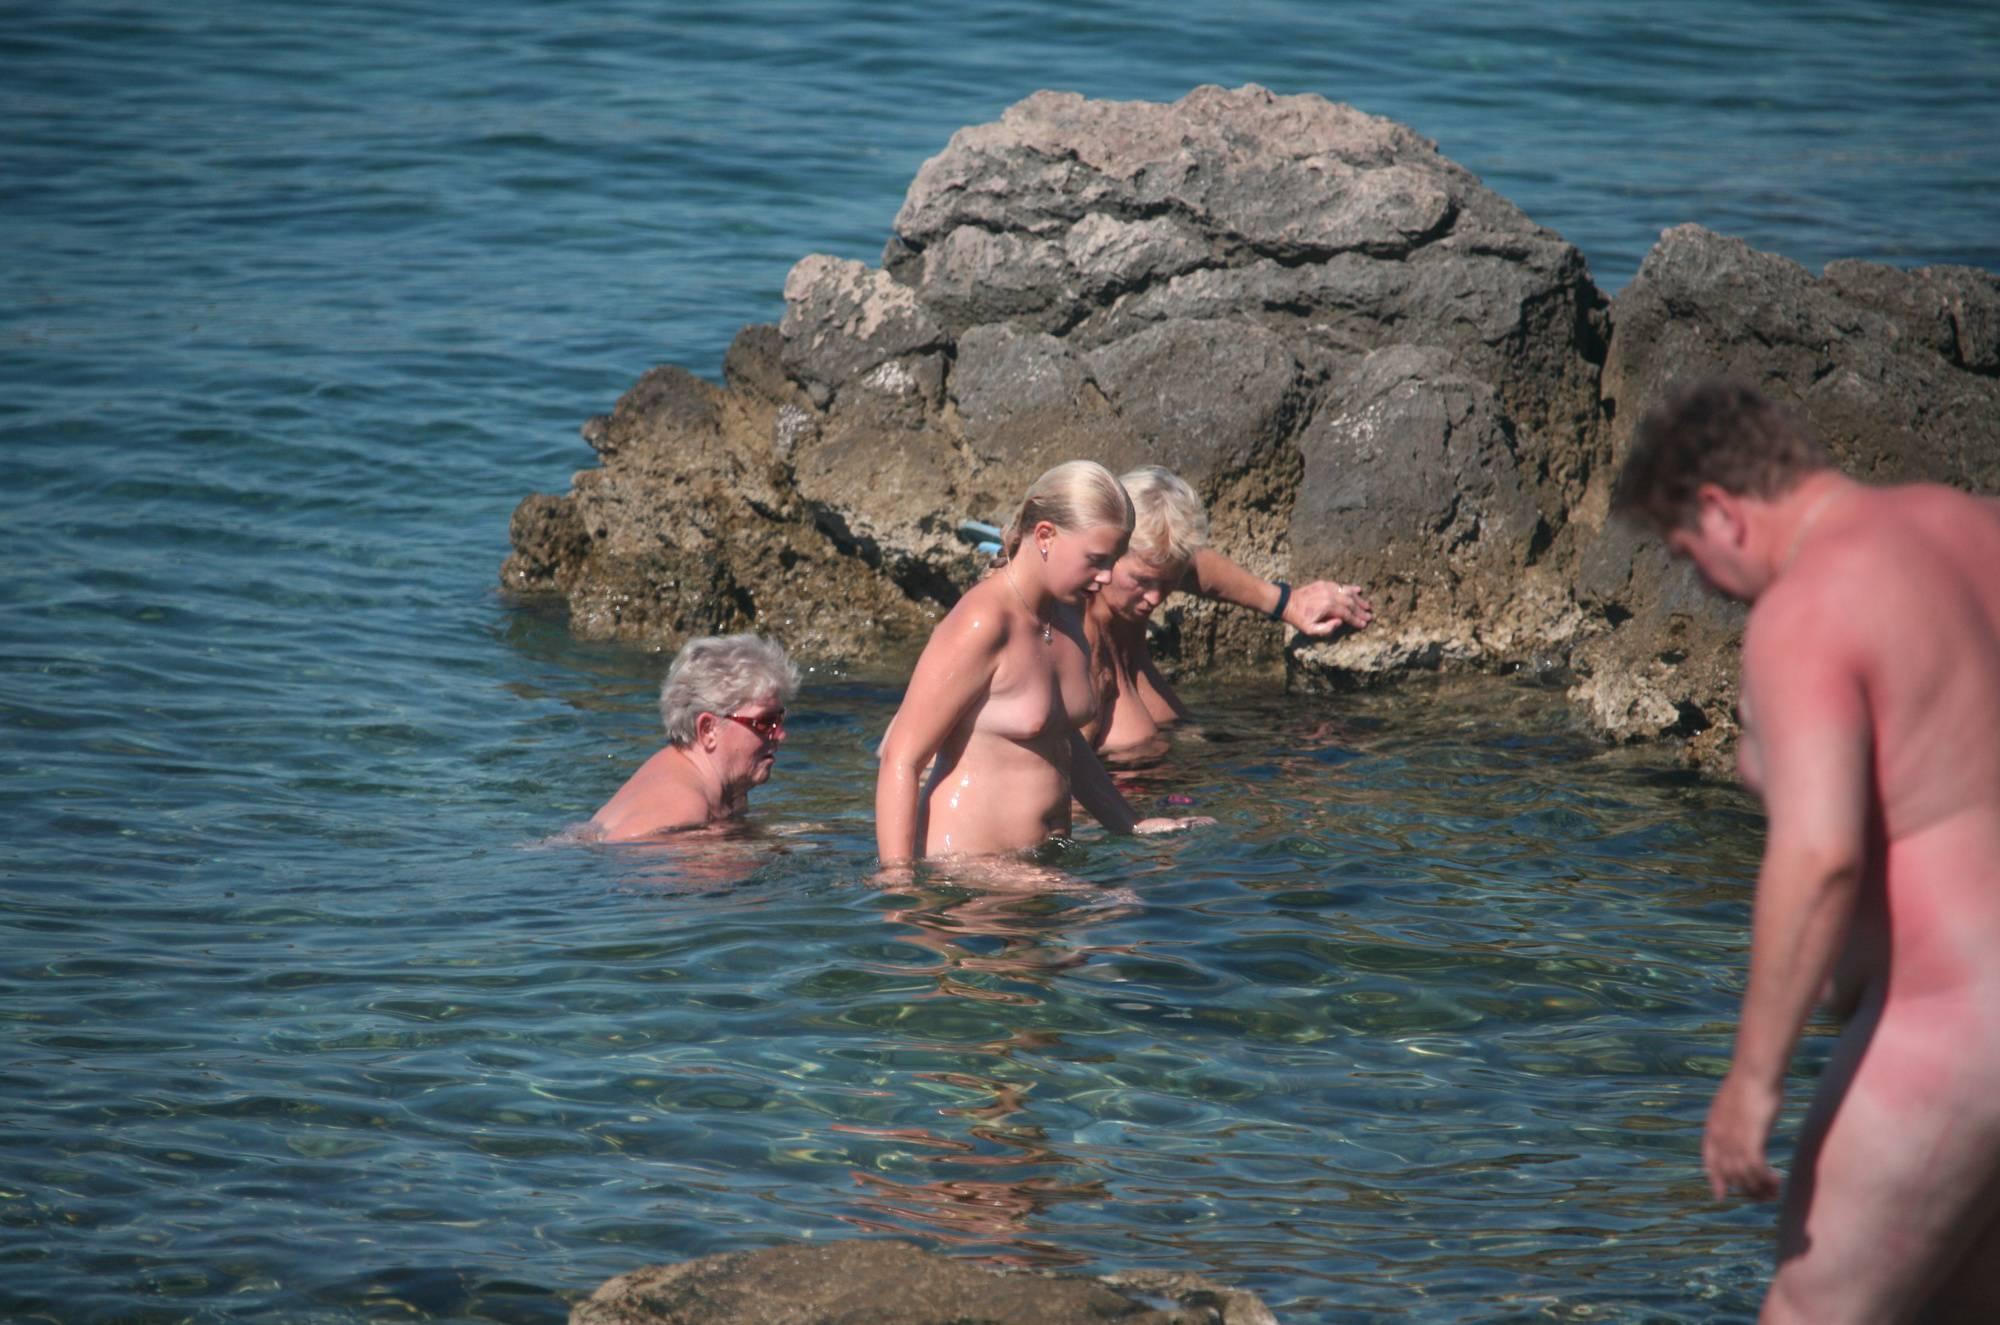 Nudist Pictures Crete One-Braided Nudist - 1